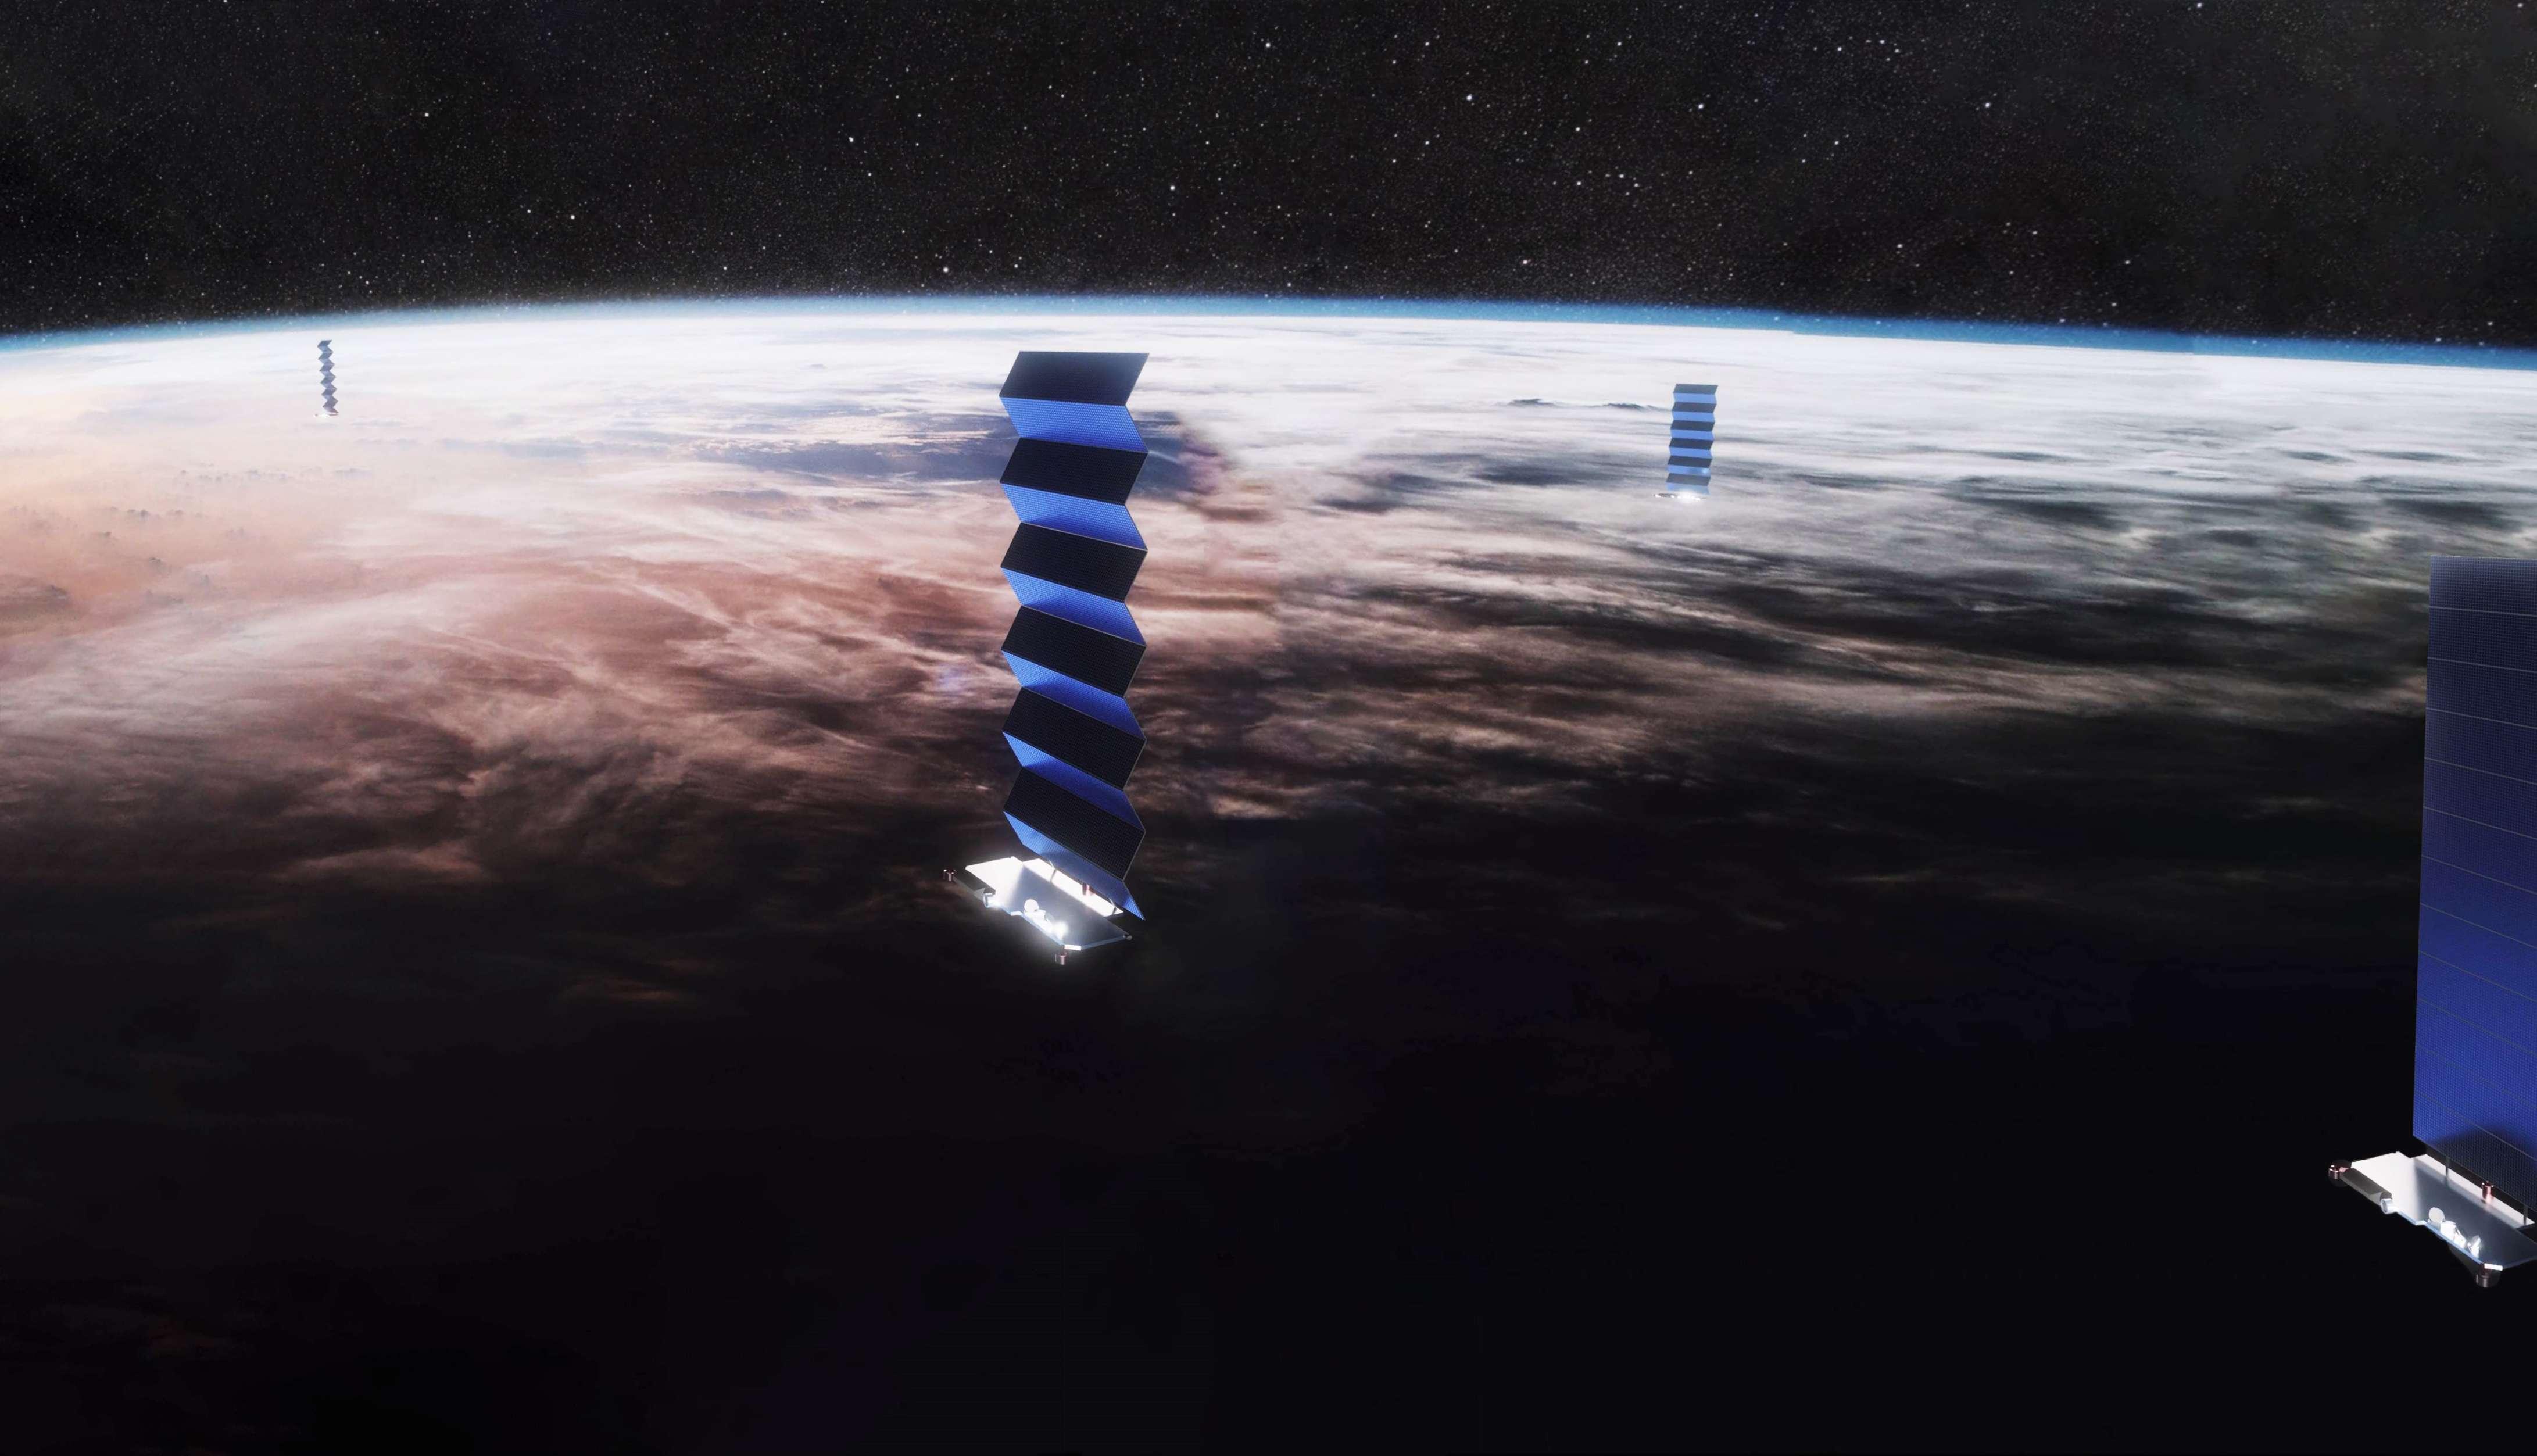 Starlink solar array deploy (SpaceX) pano 3 edit (c)